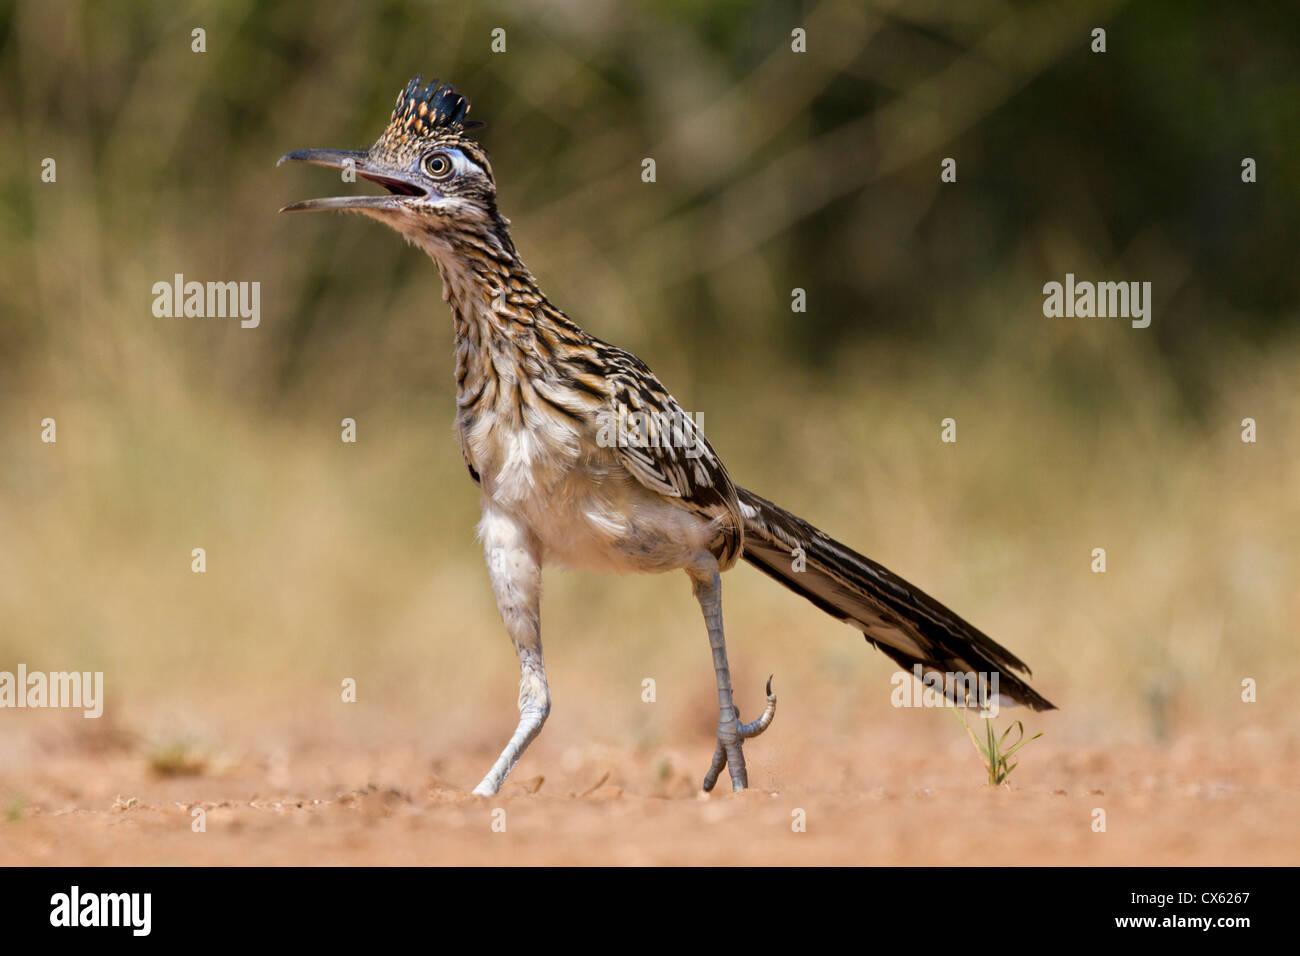 Greater Roadrunner (Geococcyx californianus) in Texas - Stock Image